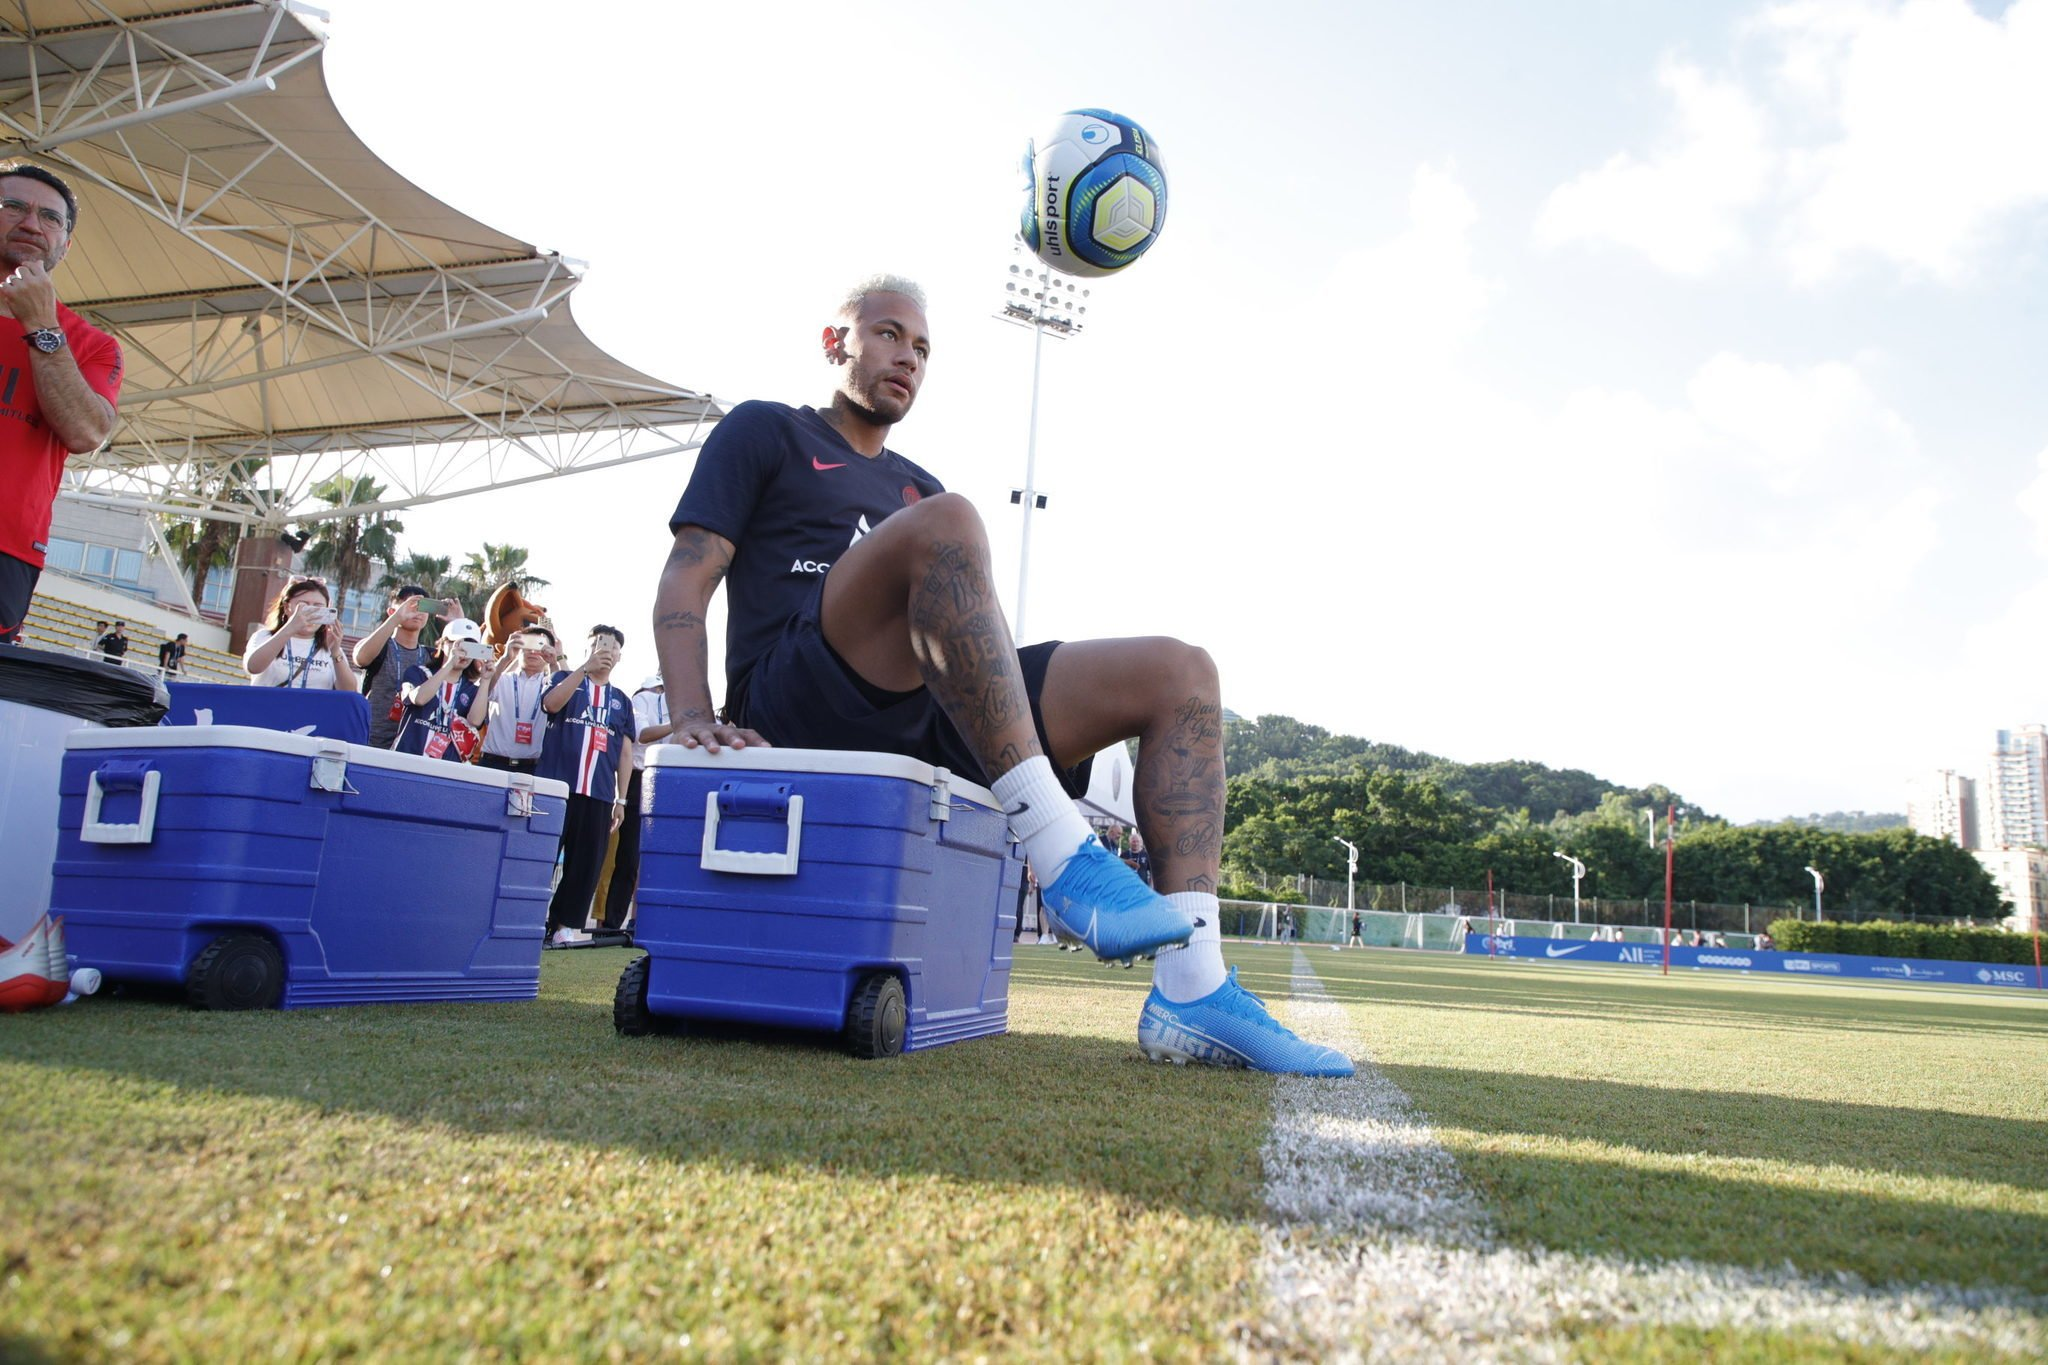 Football - Ligue 1 - PSG : ménagé, Neymar ne jouera pas ce samedi contre l'Inter Milan